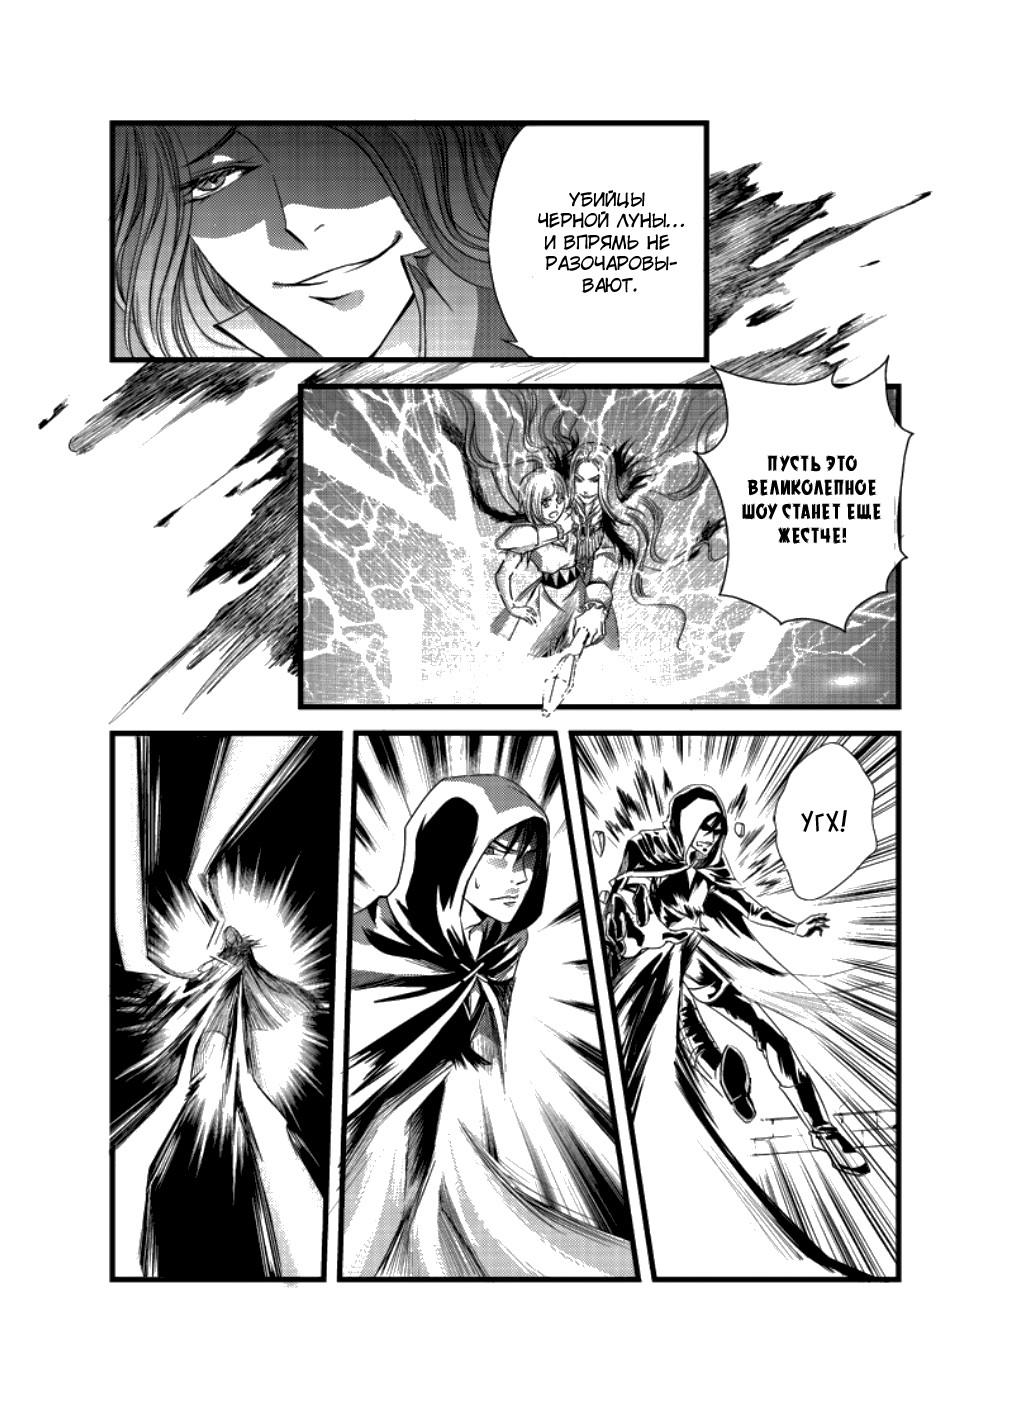 https://r1.ninemanga.com/comics/pic2/42/19946/270747/1439133235287.jpg Page 5